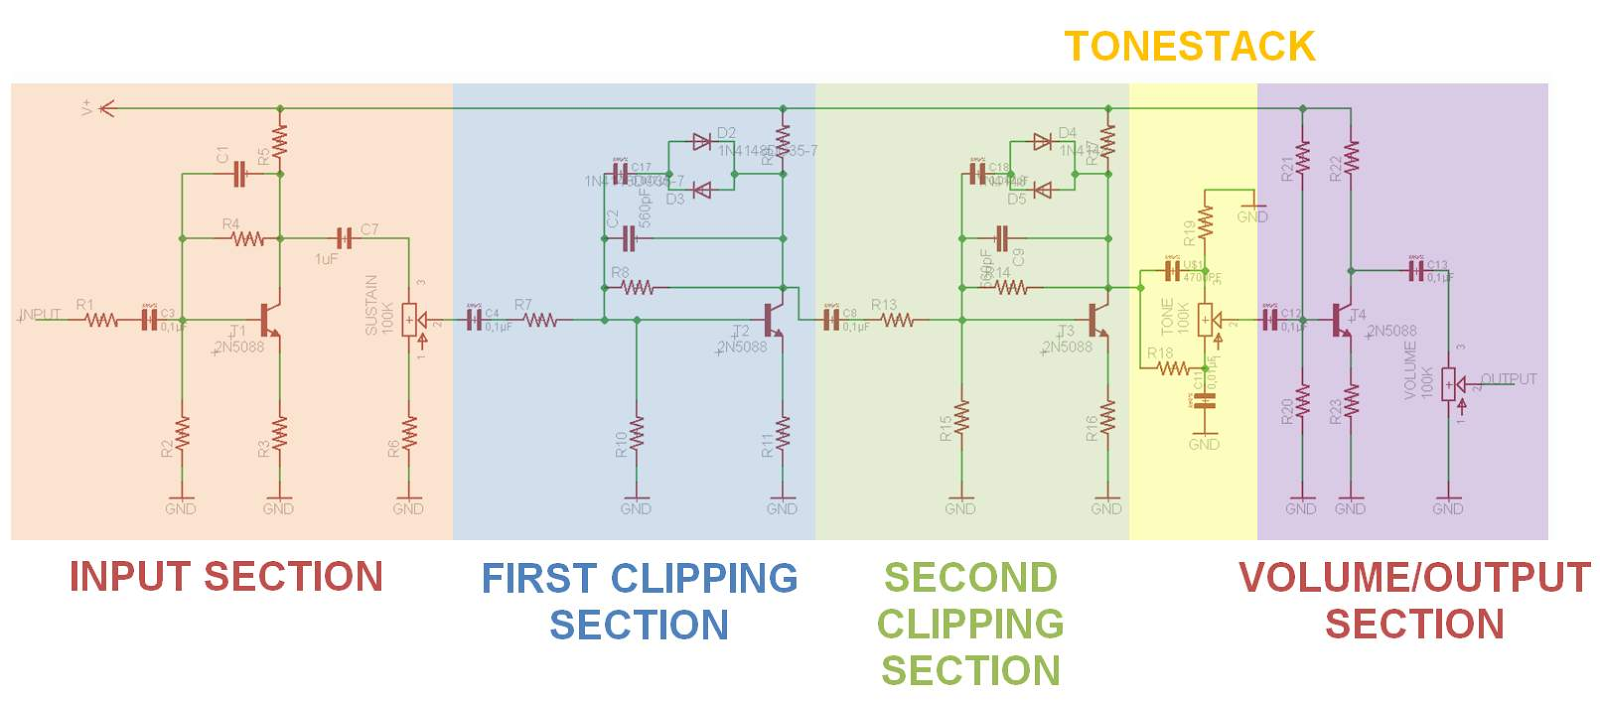 Ibanez Sd9 Schematic also 123 Whitby Weekend Away moreover Guitar Effect Pedal Schematics likewise Rj11 Female Wiring Diagram also Schematic Mxr Noise Gate. on mxr distortion plus schematic diagram